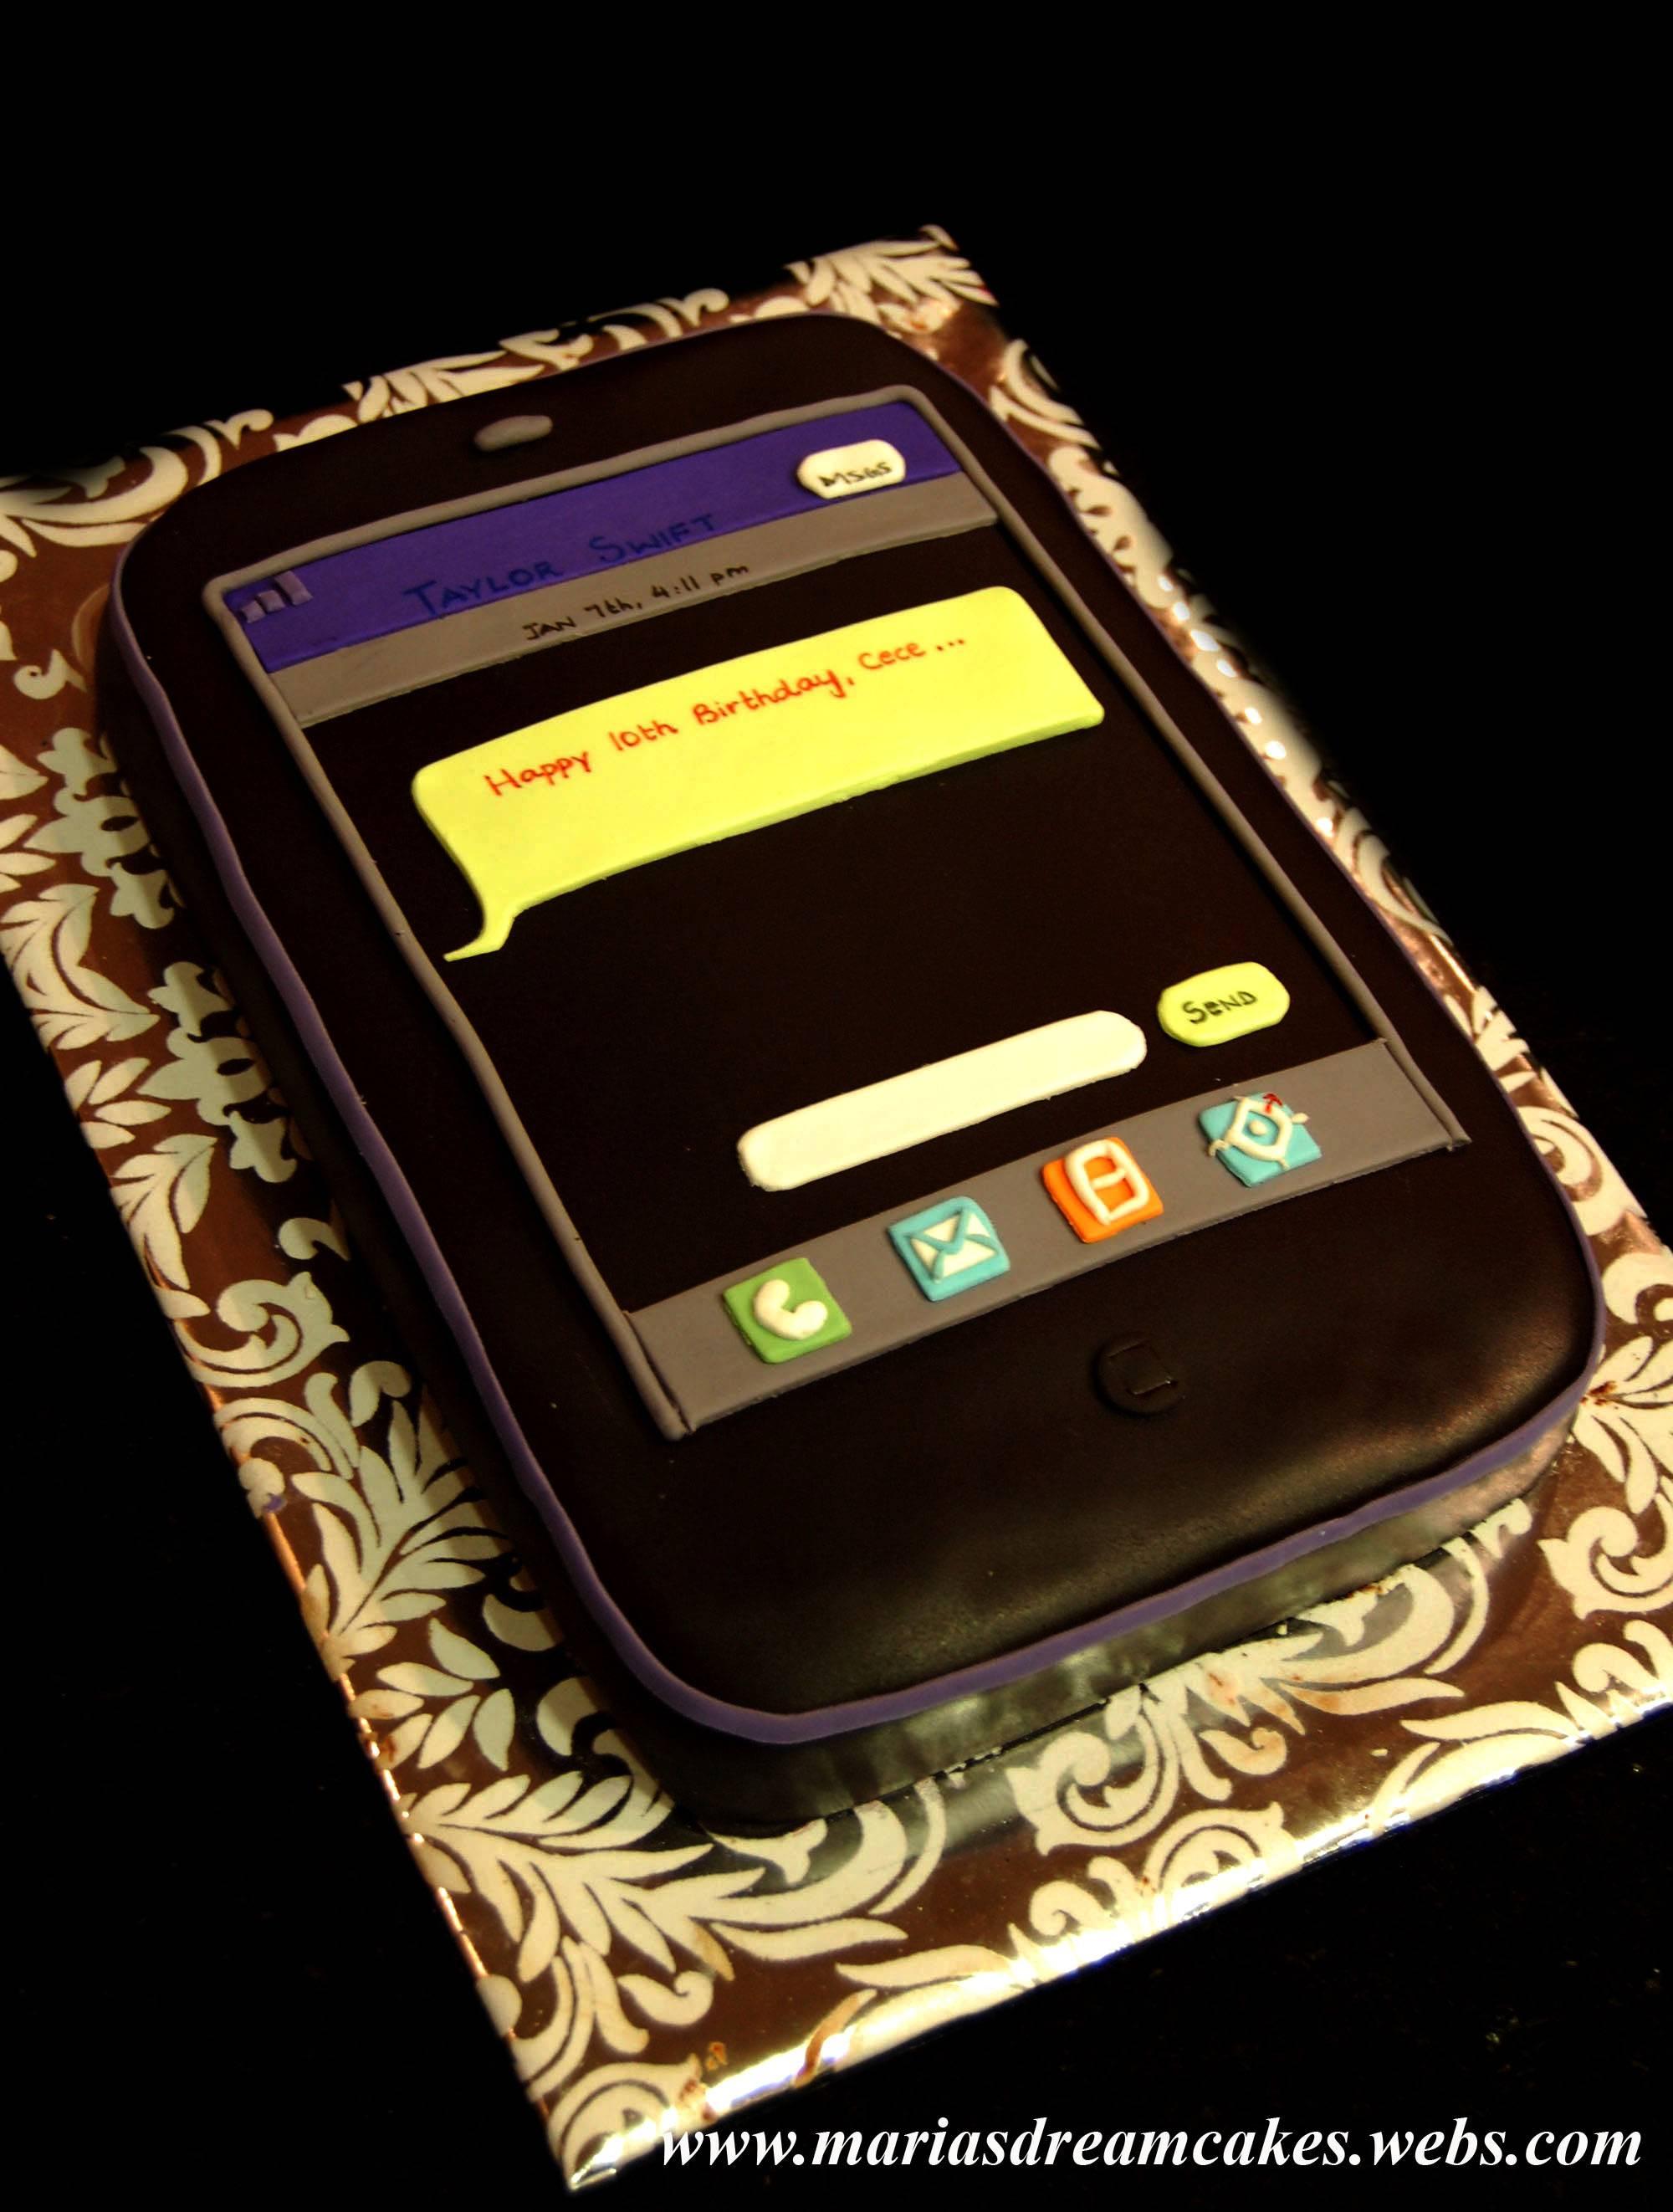 'IPhone' Cake